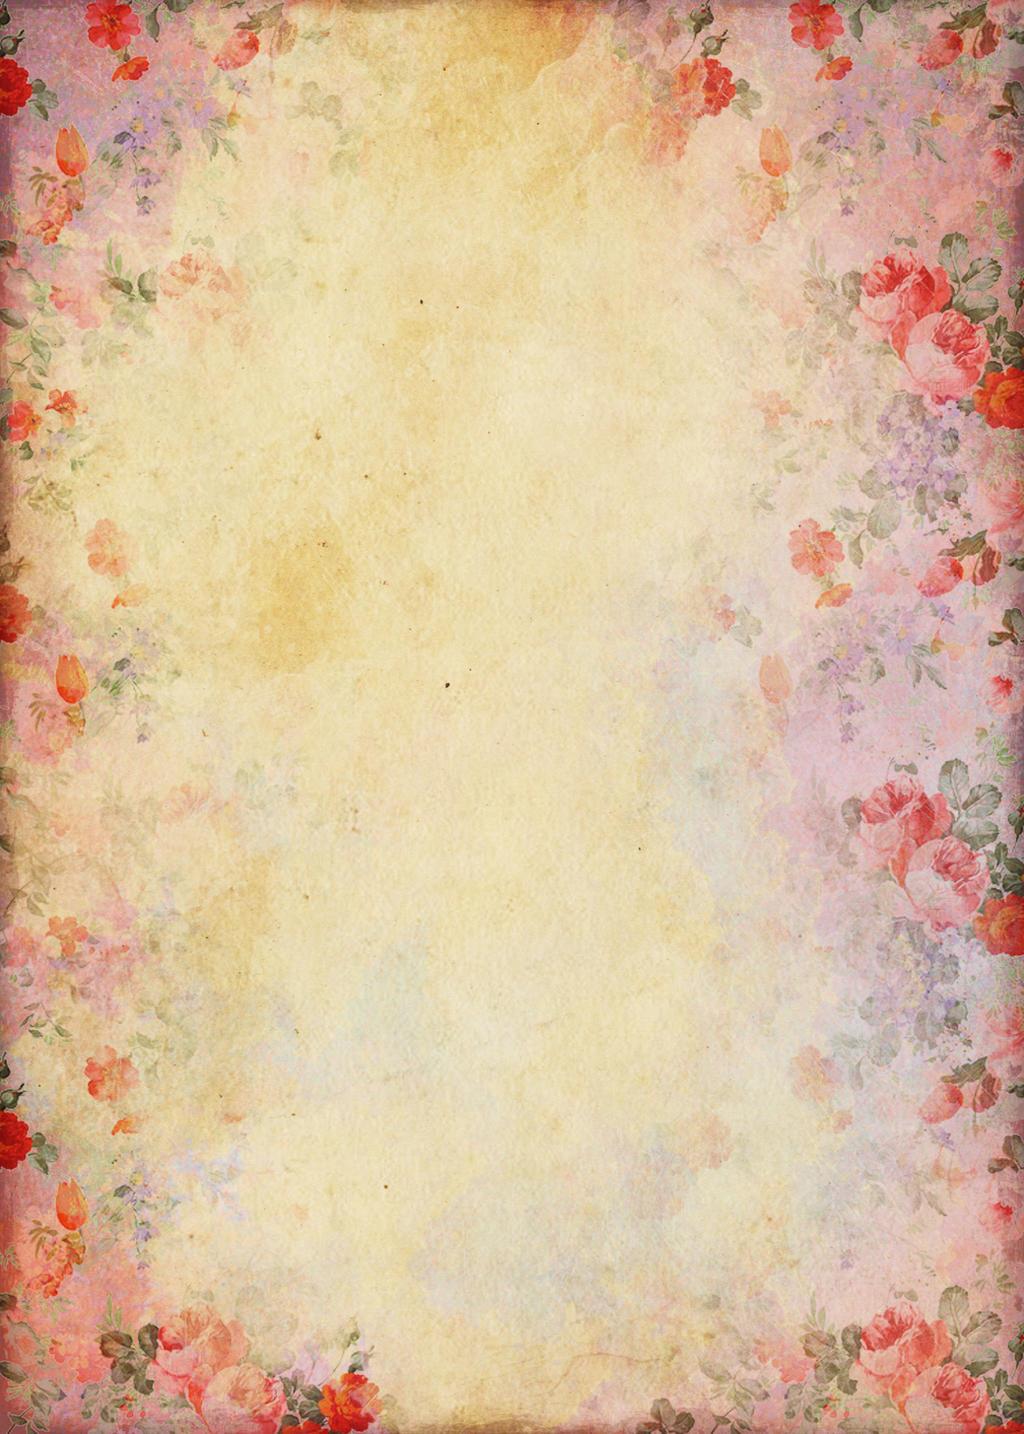 Freebie Shabby Flower Paper Background By Miabumbag On Deviantart